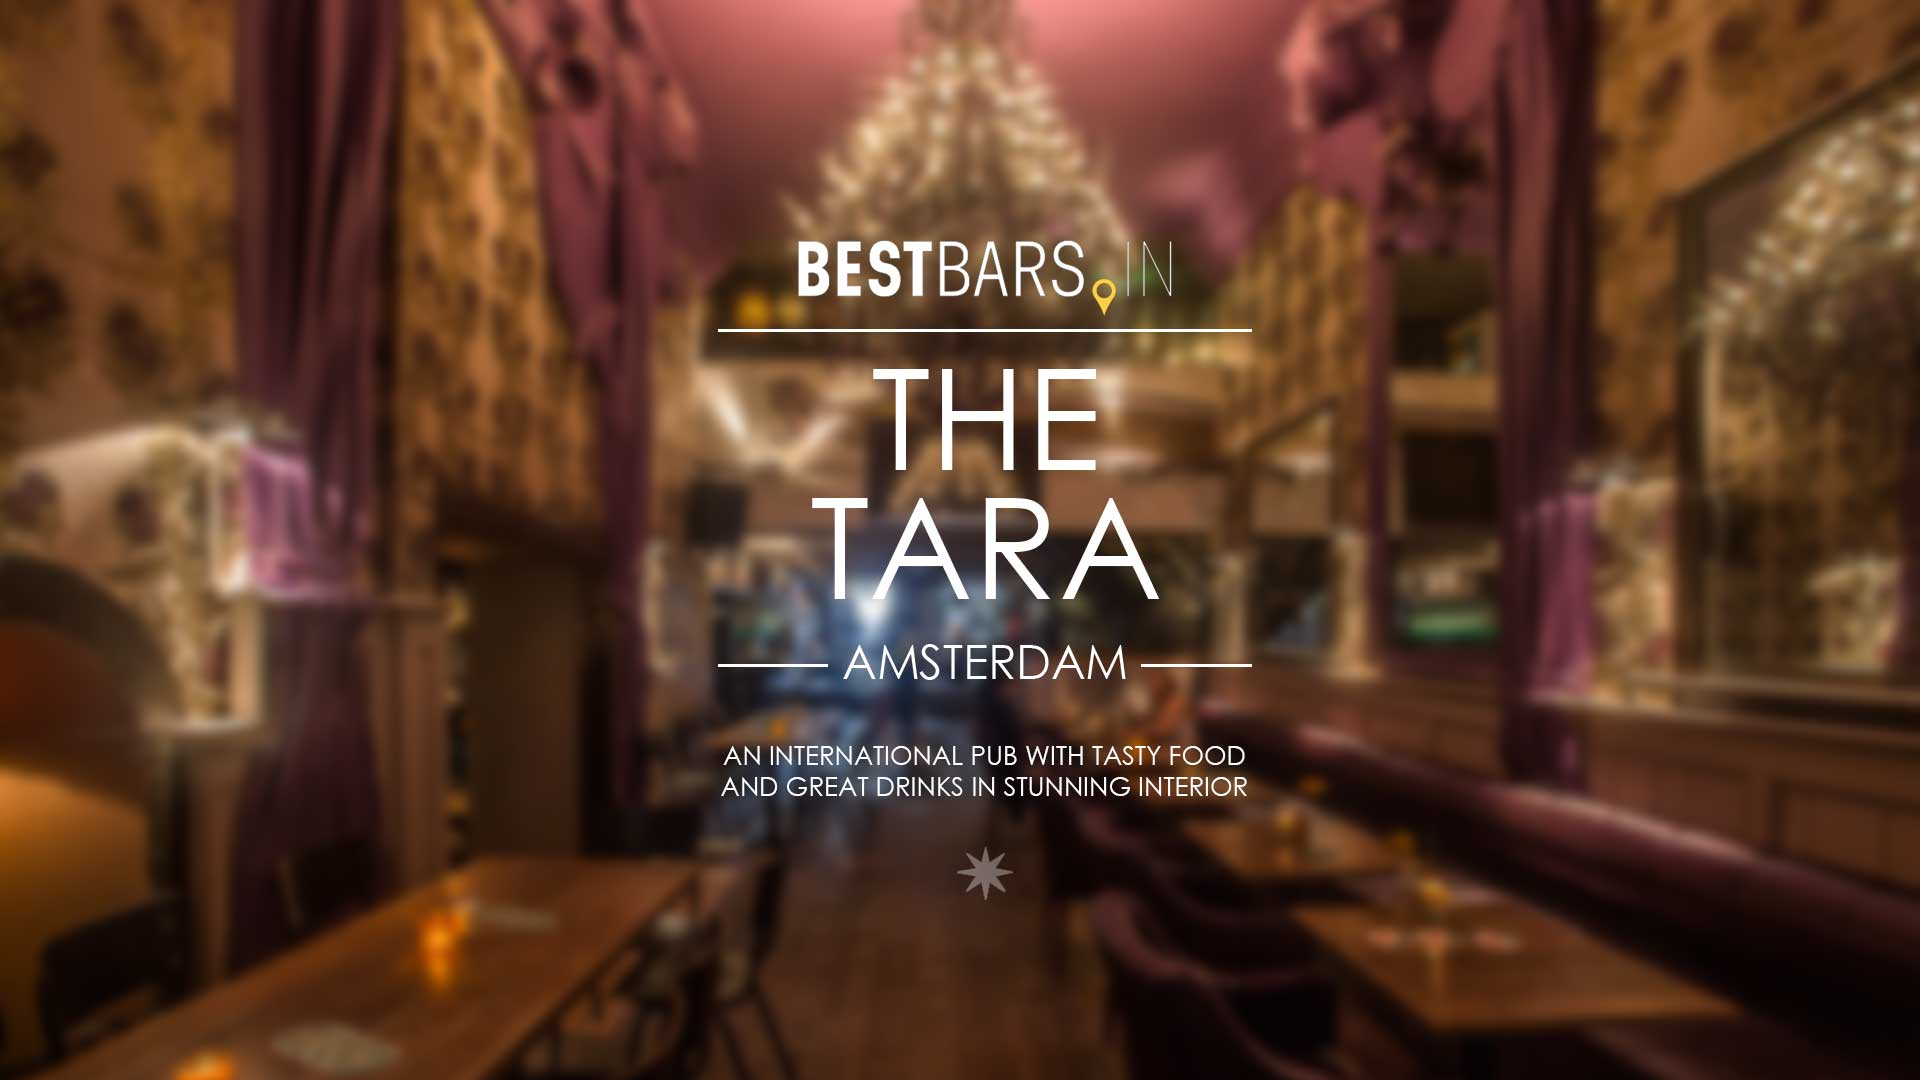 The Tara - an international pub in Amsterdam city center